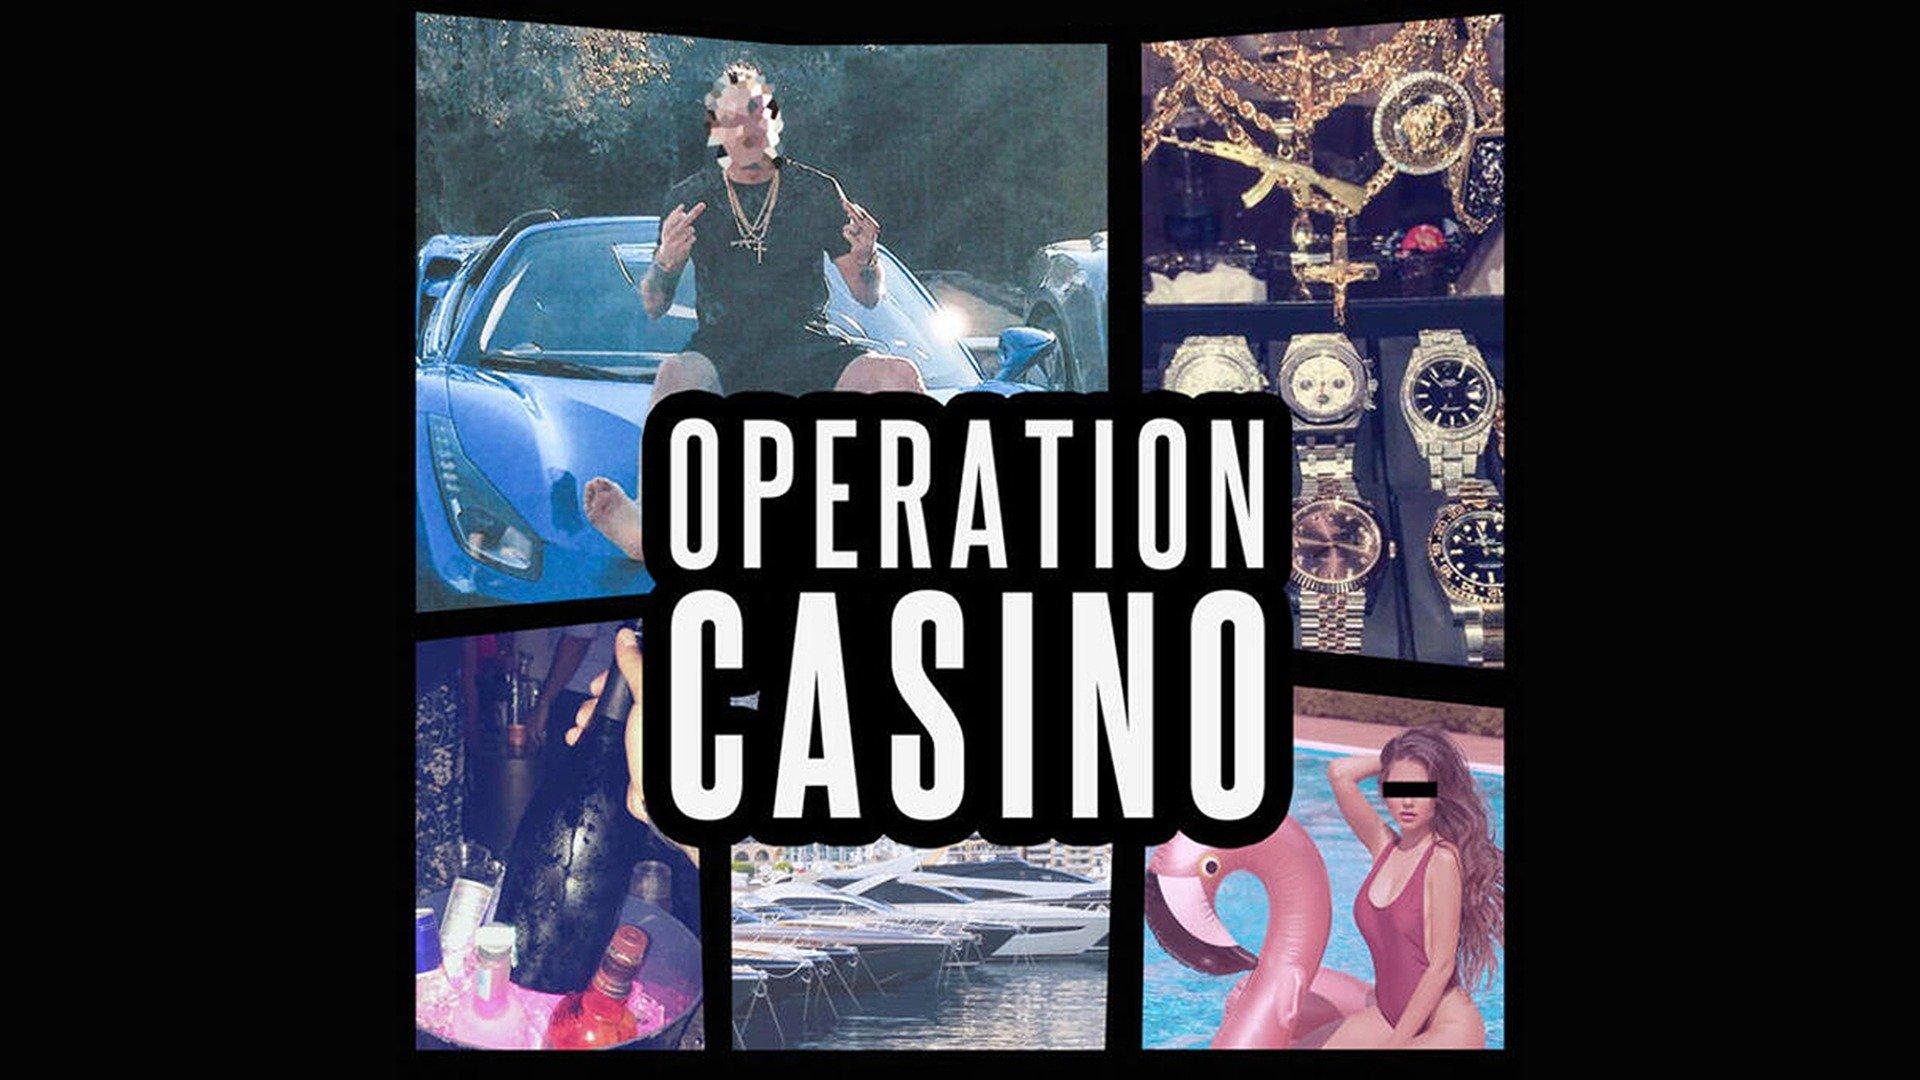 Operation Casino